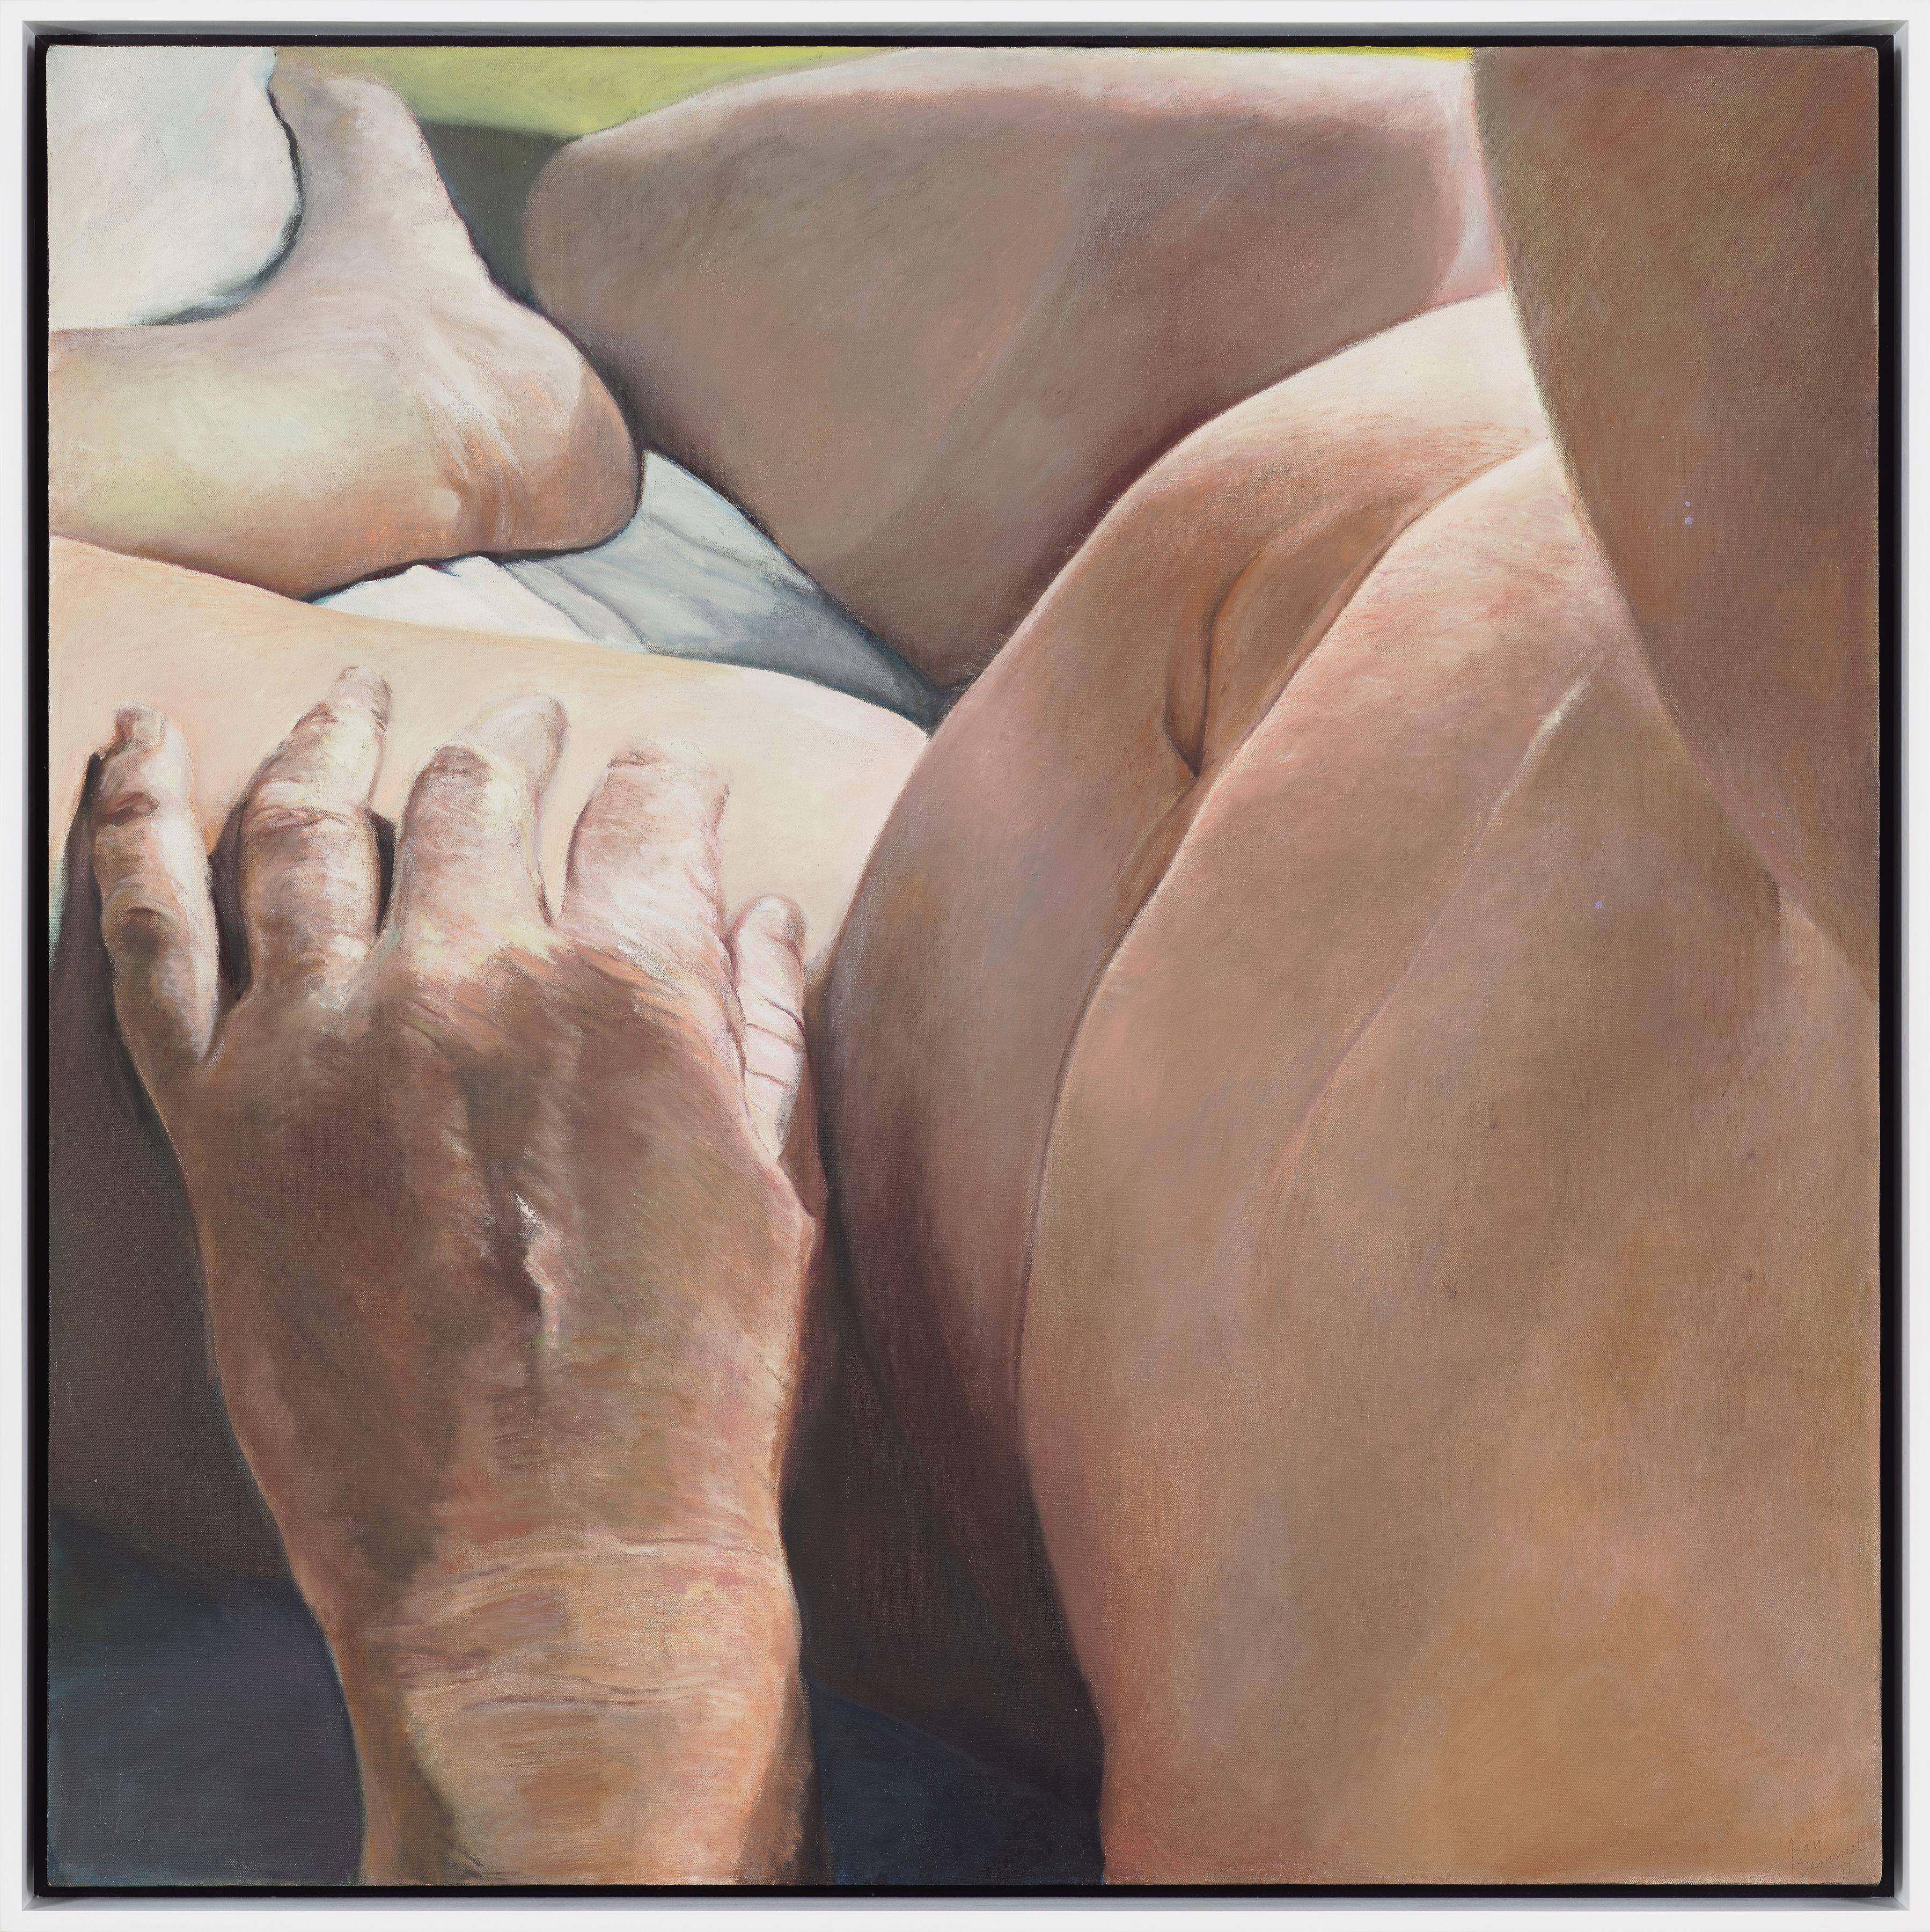 Joan Semmel, Foreground Hand, 1977